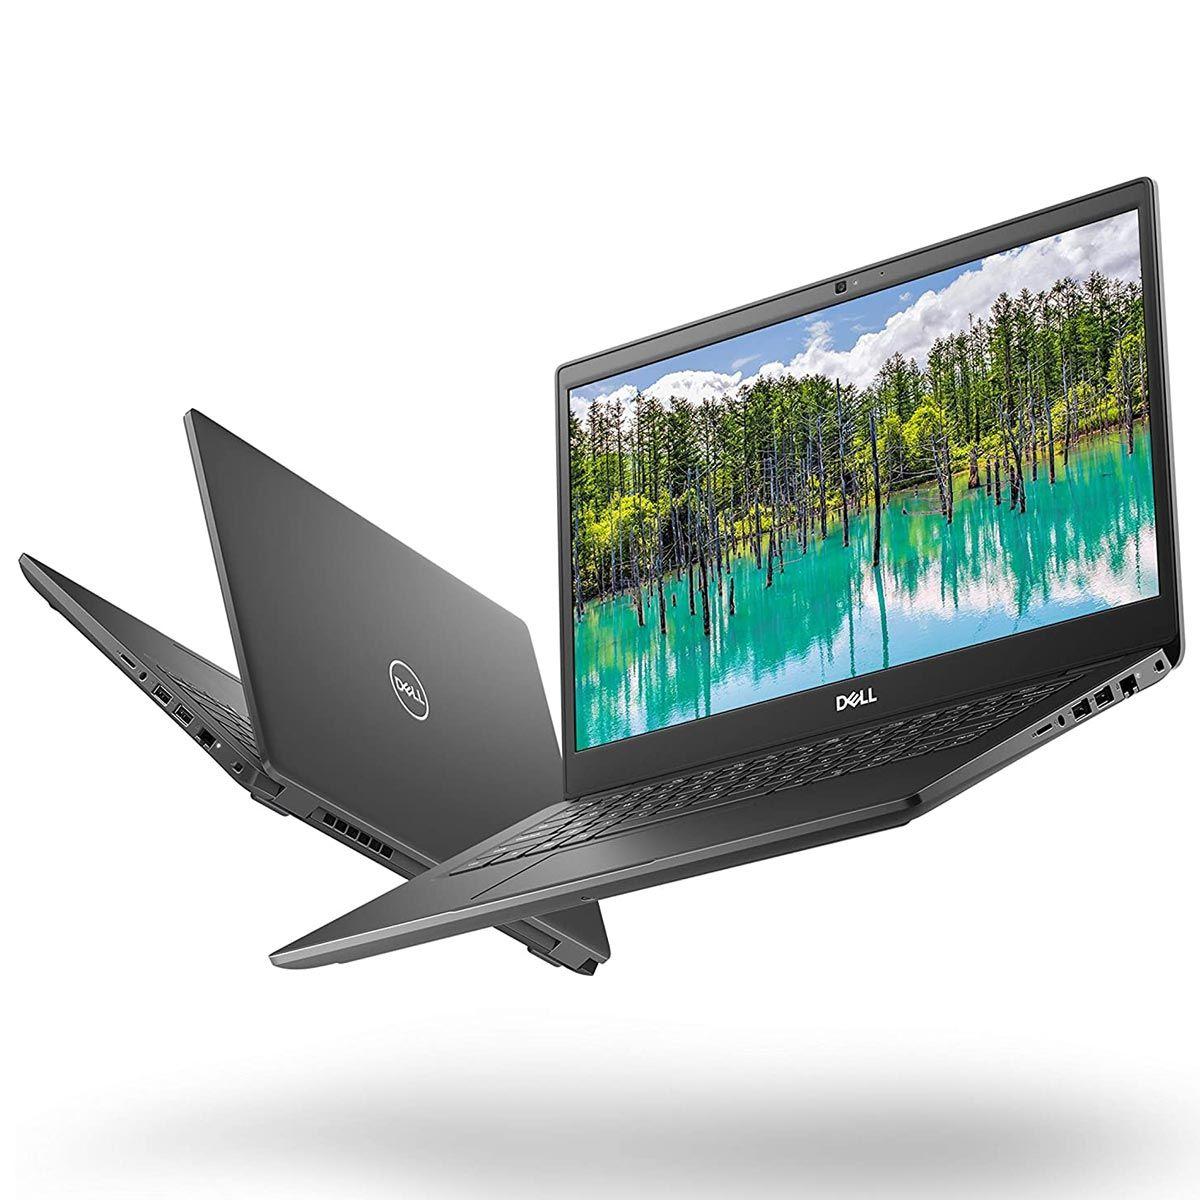 "Dell Vostro 3500 i5 11th Gen / 4GB RAM / 1TB HDD / 15.6"" FHD Dis"